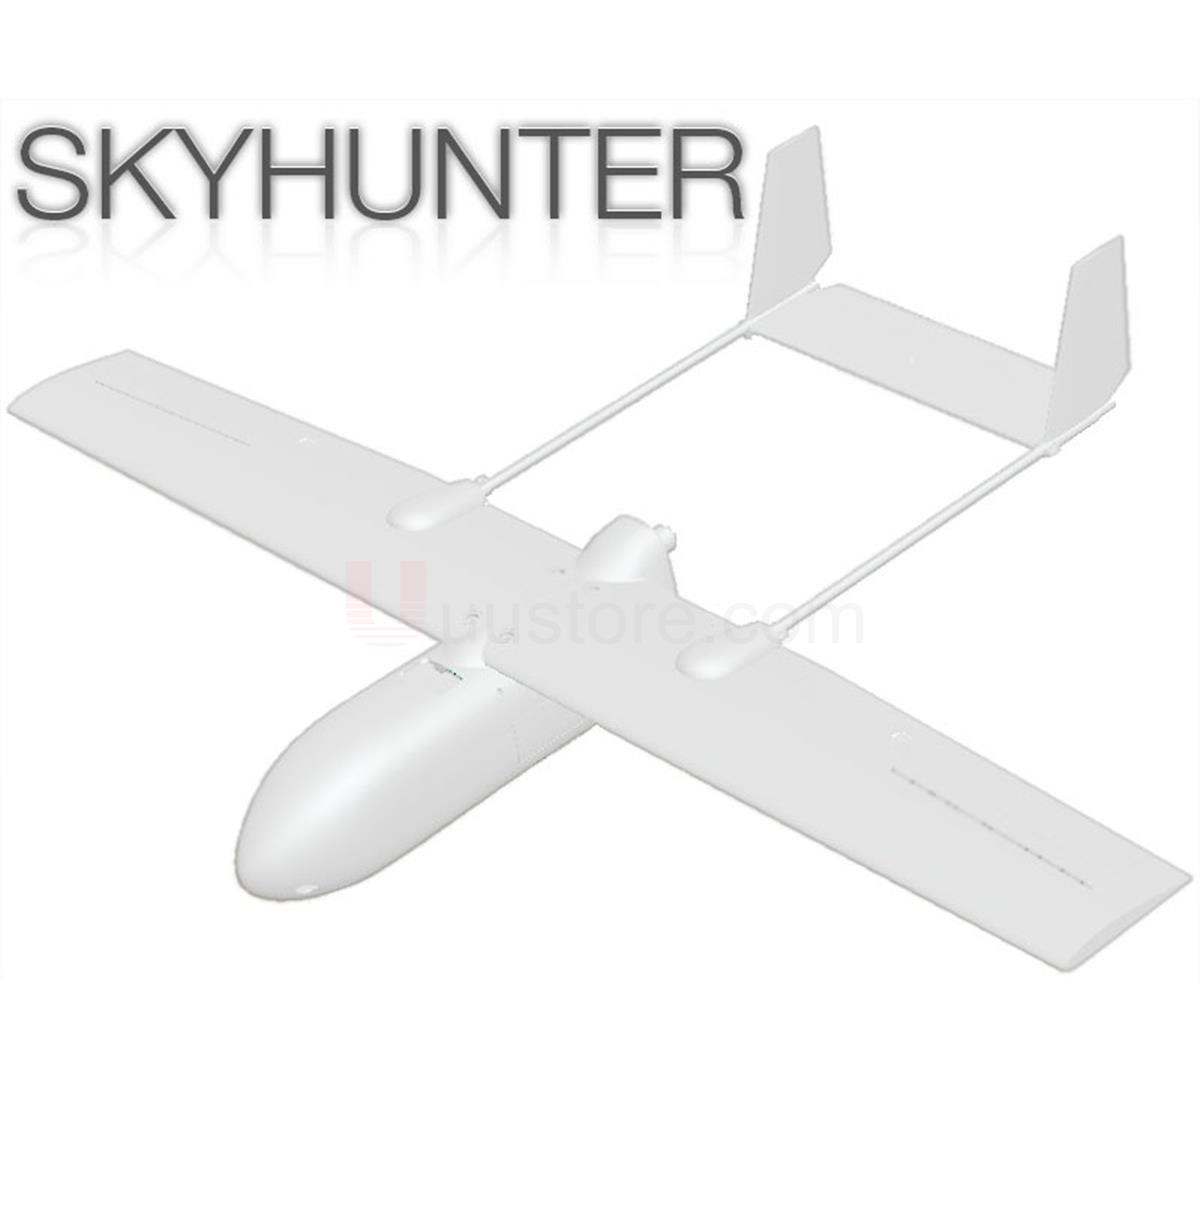 FPV Airplane Skyhunter 1.8m EPO Wings FPV Platform UAV Remote Control Electric Powered Glider RC Model EPO Plane FPV necessary new 2016 2015 skywalker 1830 1830mm fpv plane latest version uav remote control electric glider rc model epo white airplane kits